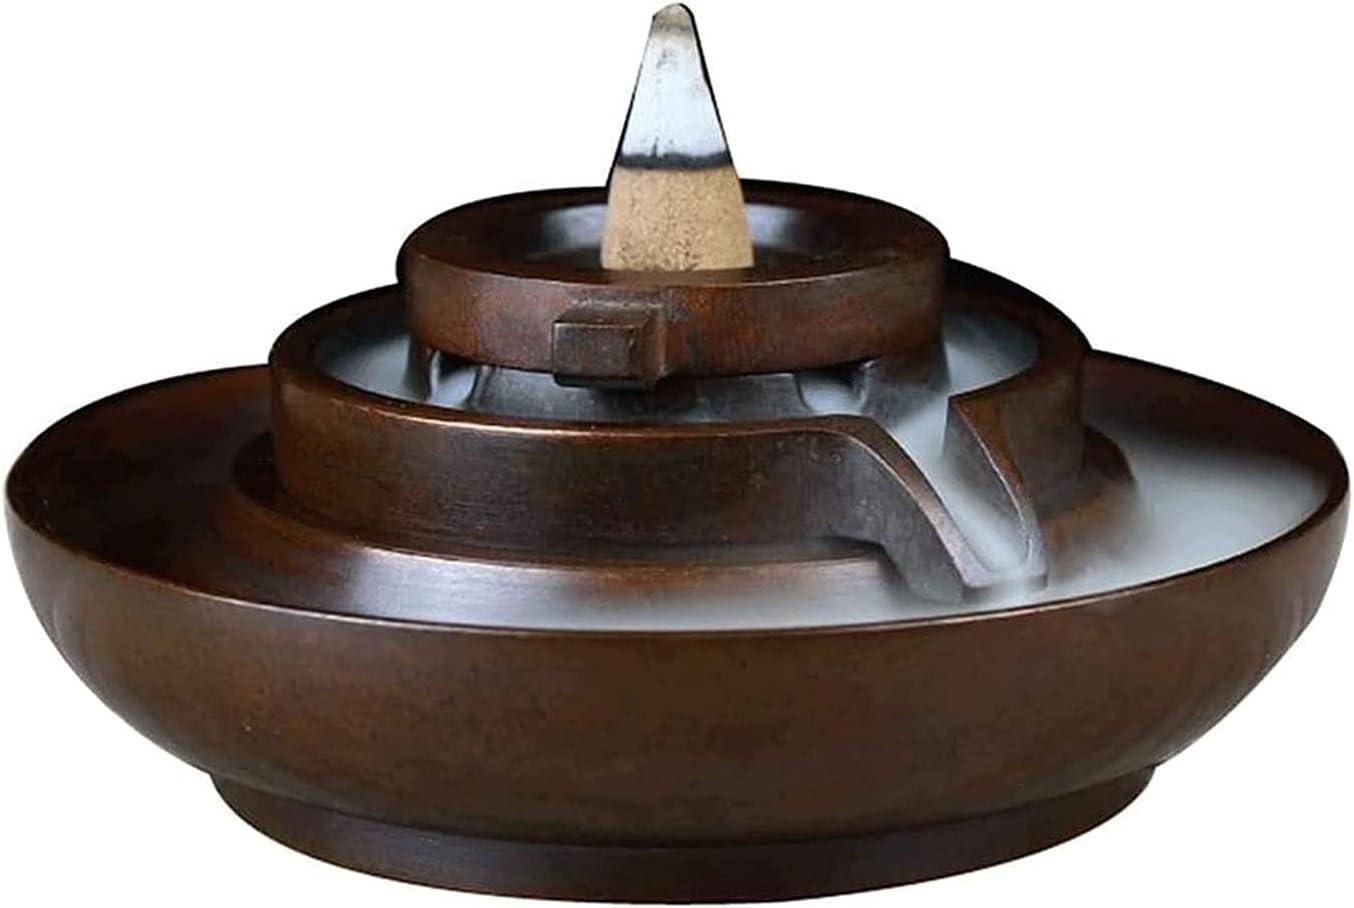 TUQIAODIAN Very popular Waterfall online shop Incense Inc Burner Backflow